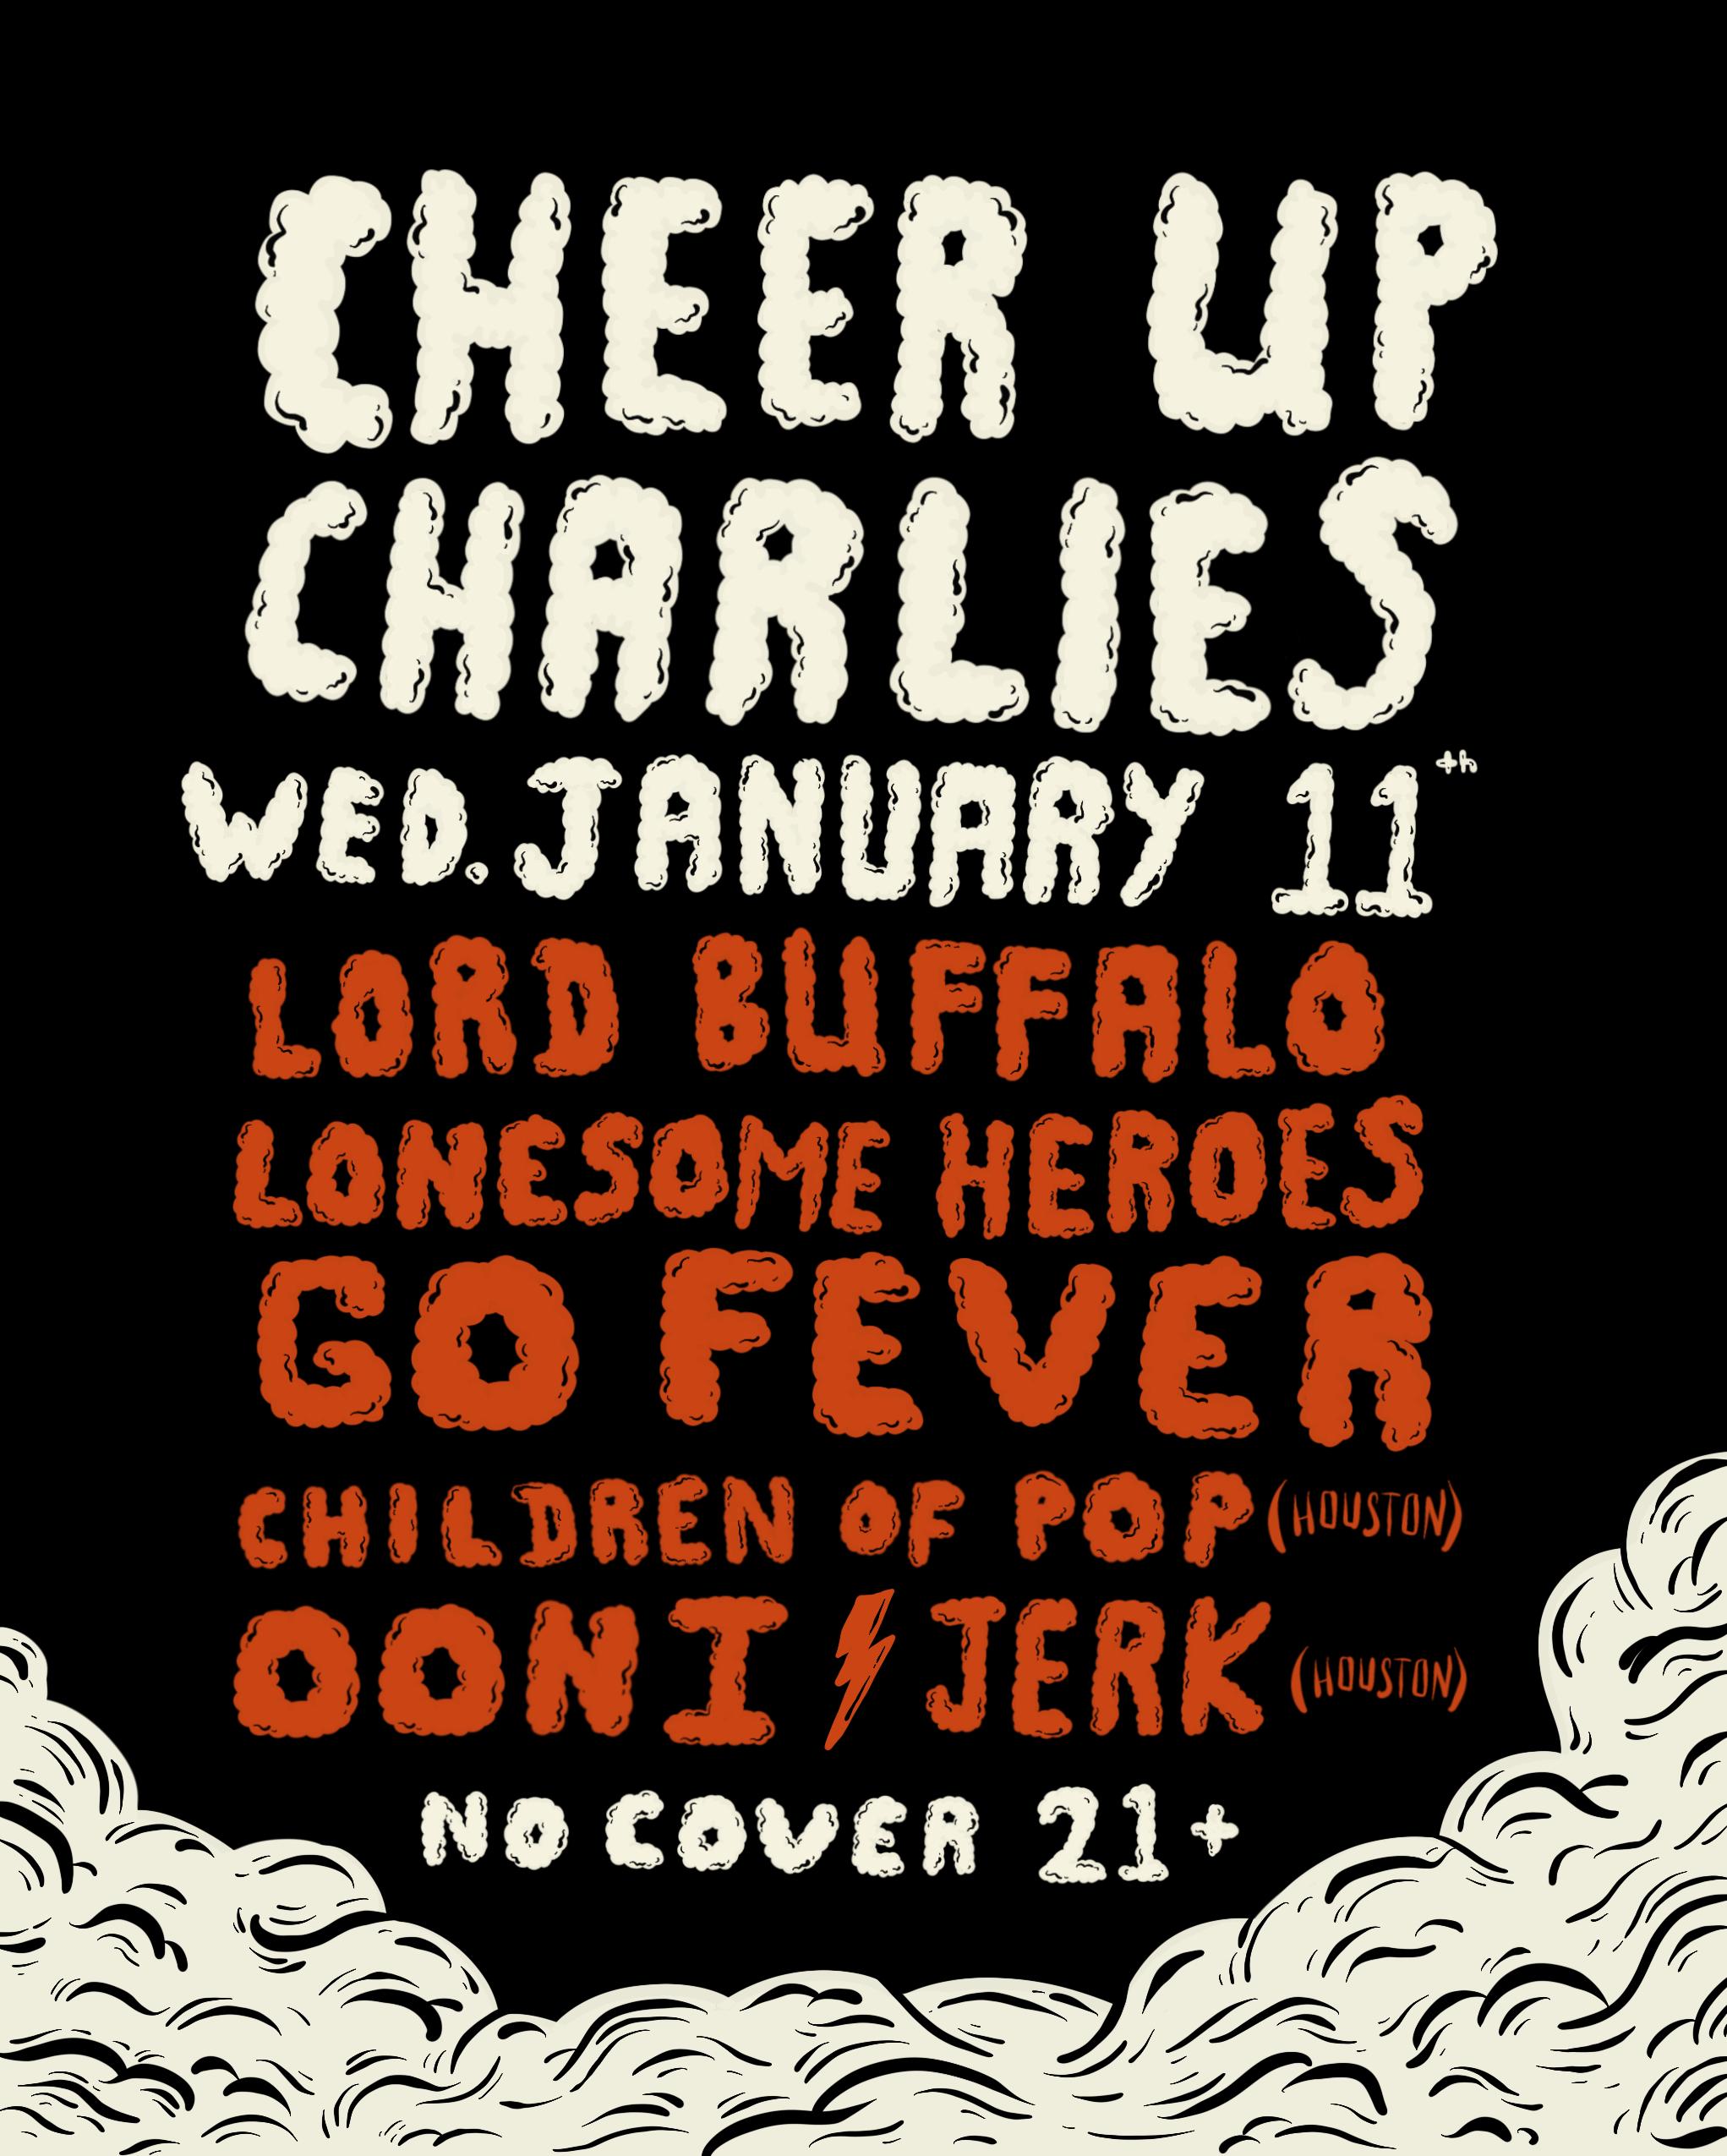 Amarah_CheerUpCharliesFlyer_January 11th.png